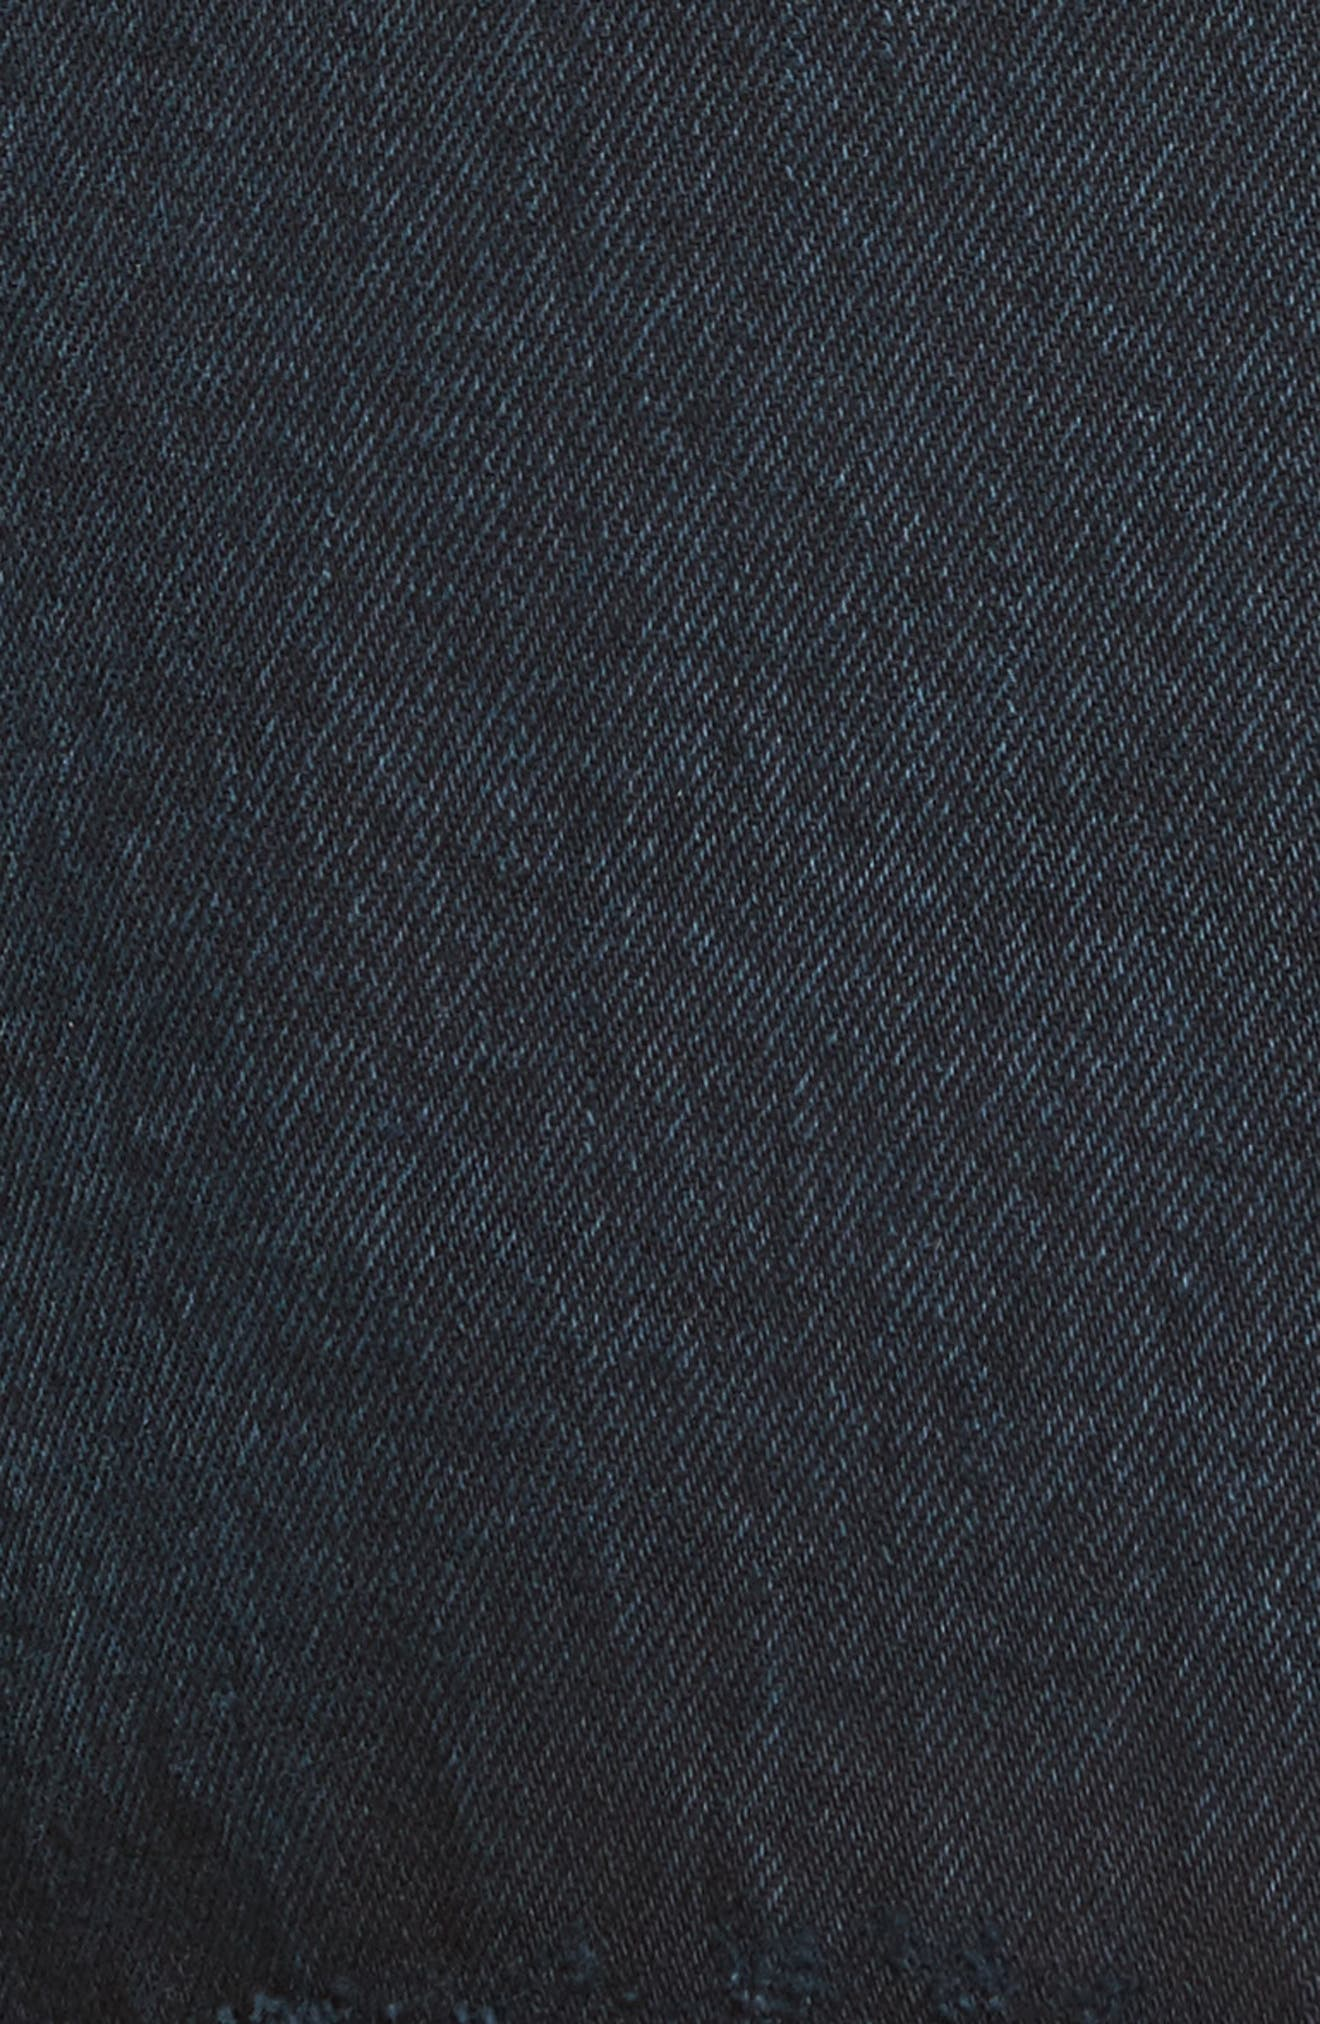 PSWL Folded Denim Skirt,                             Alternate thumbnail 6, color,                             Stone Washed Black